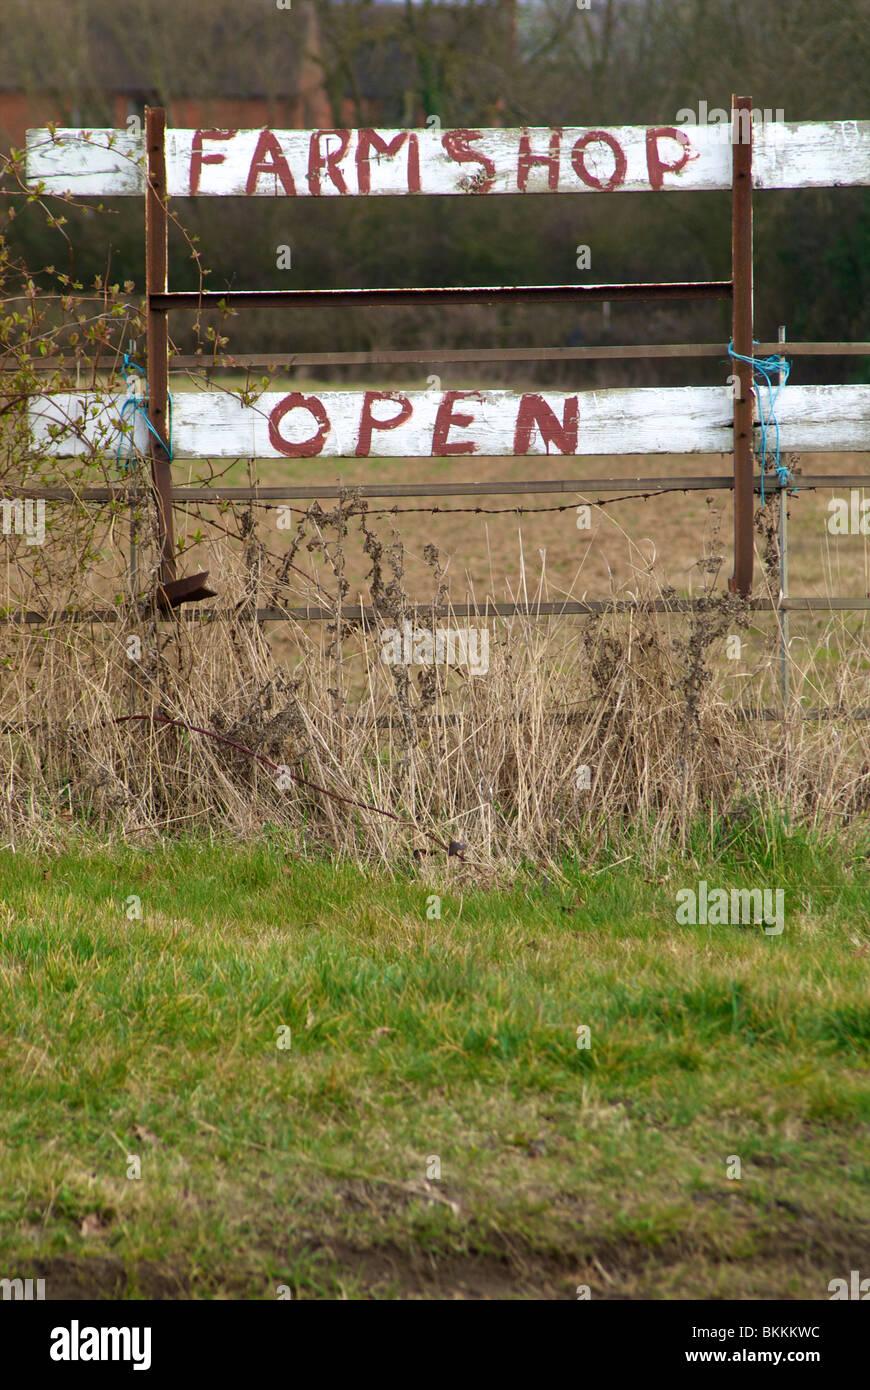 Farm Shop Open Sign Rustic - Stock Image